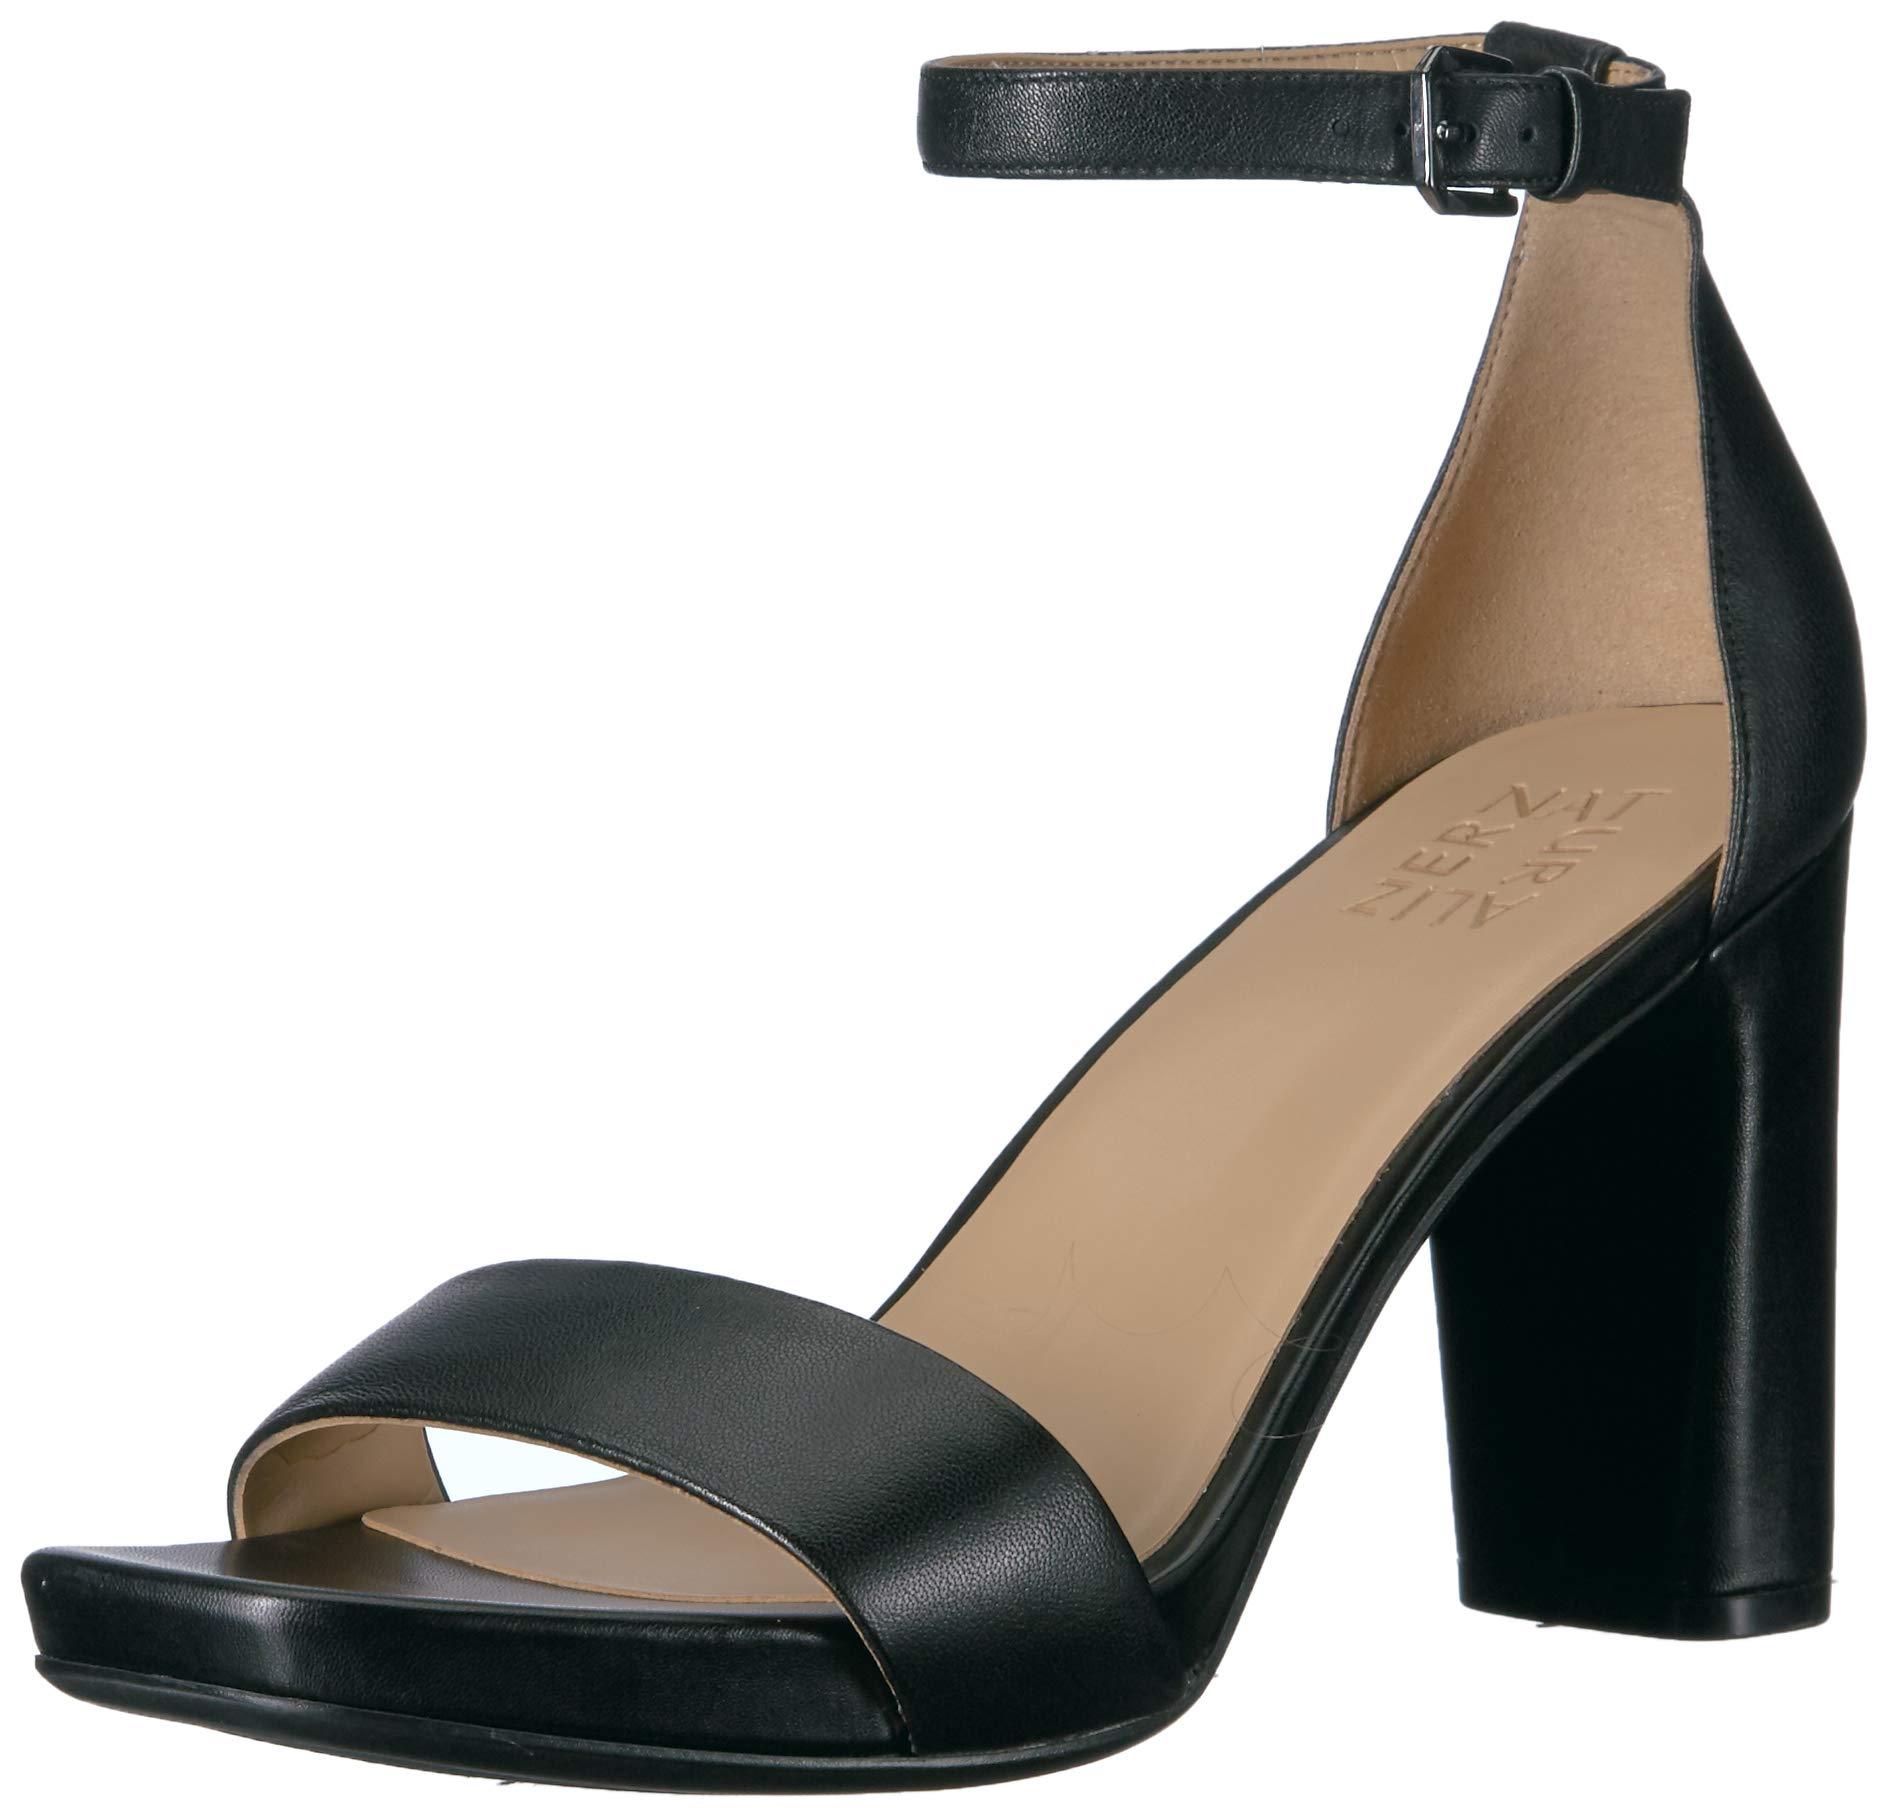 Naturalizer Women's Joy Heeled Sandal, Black Leather, 7 M US by Naturalizer